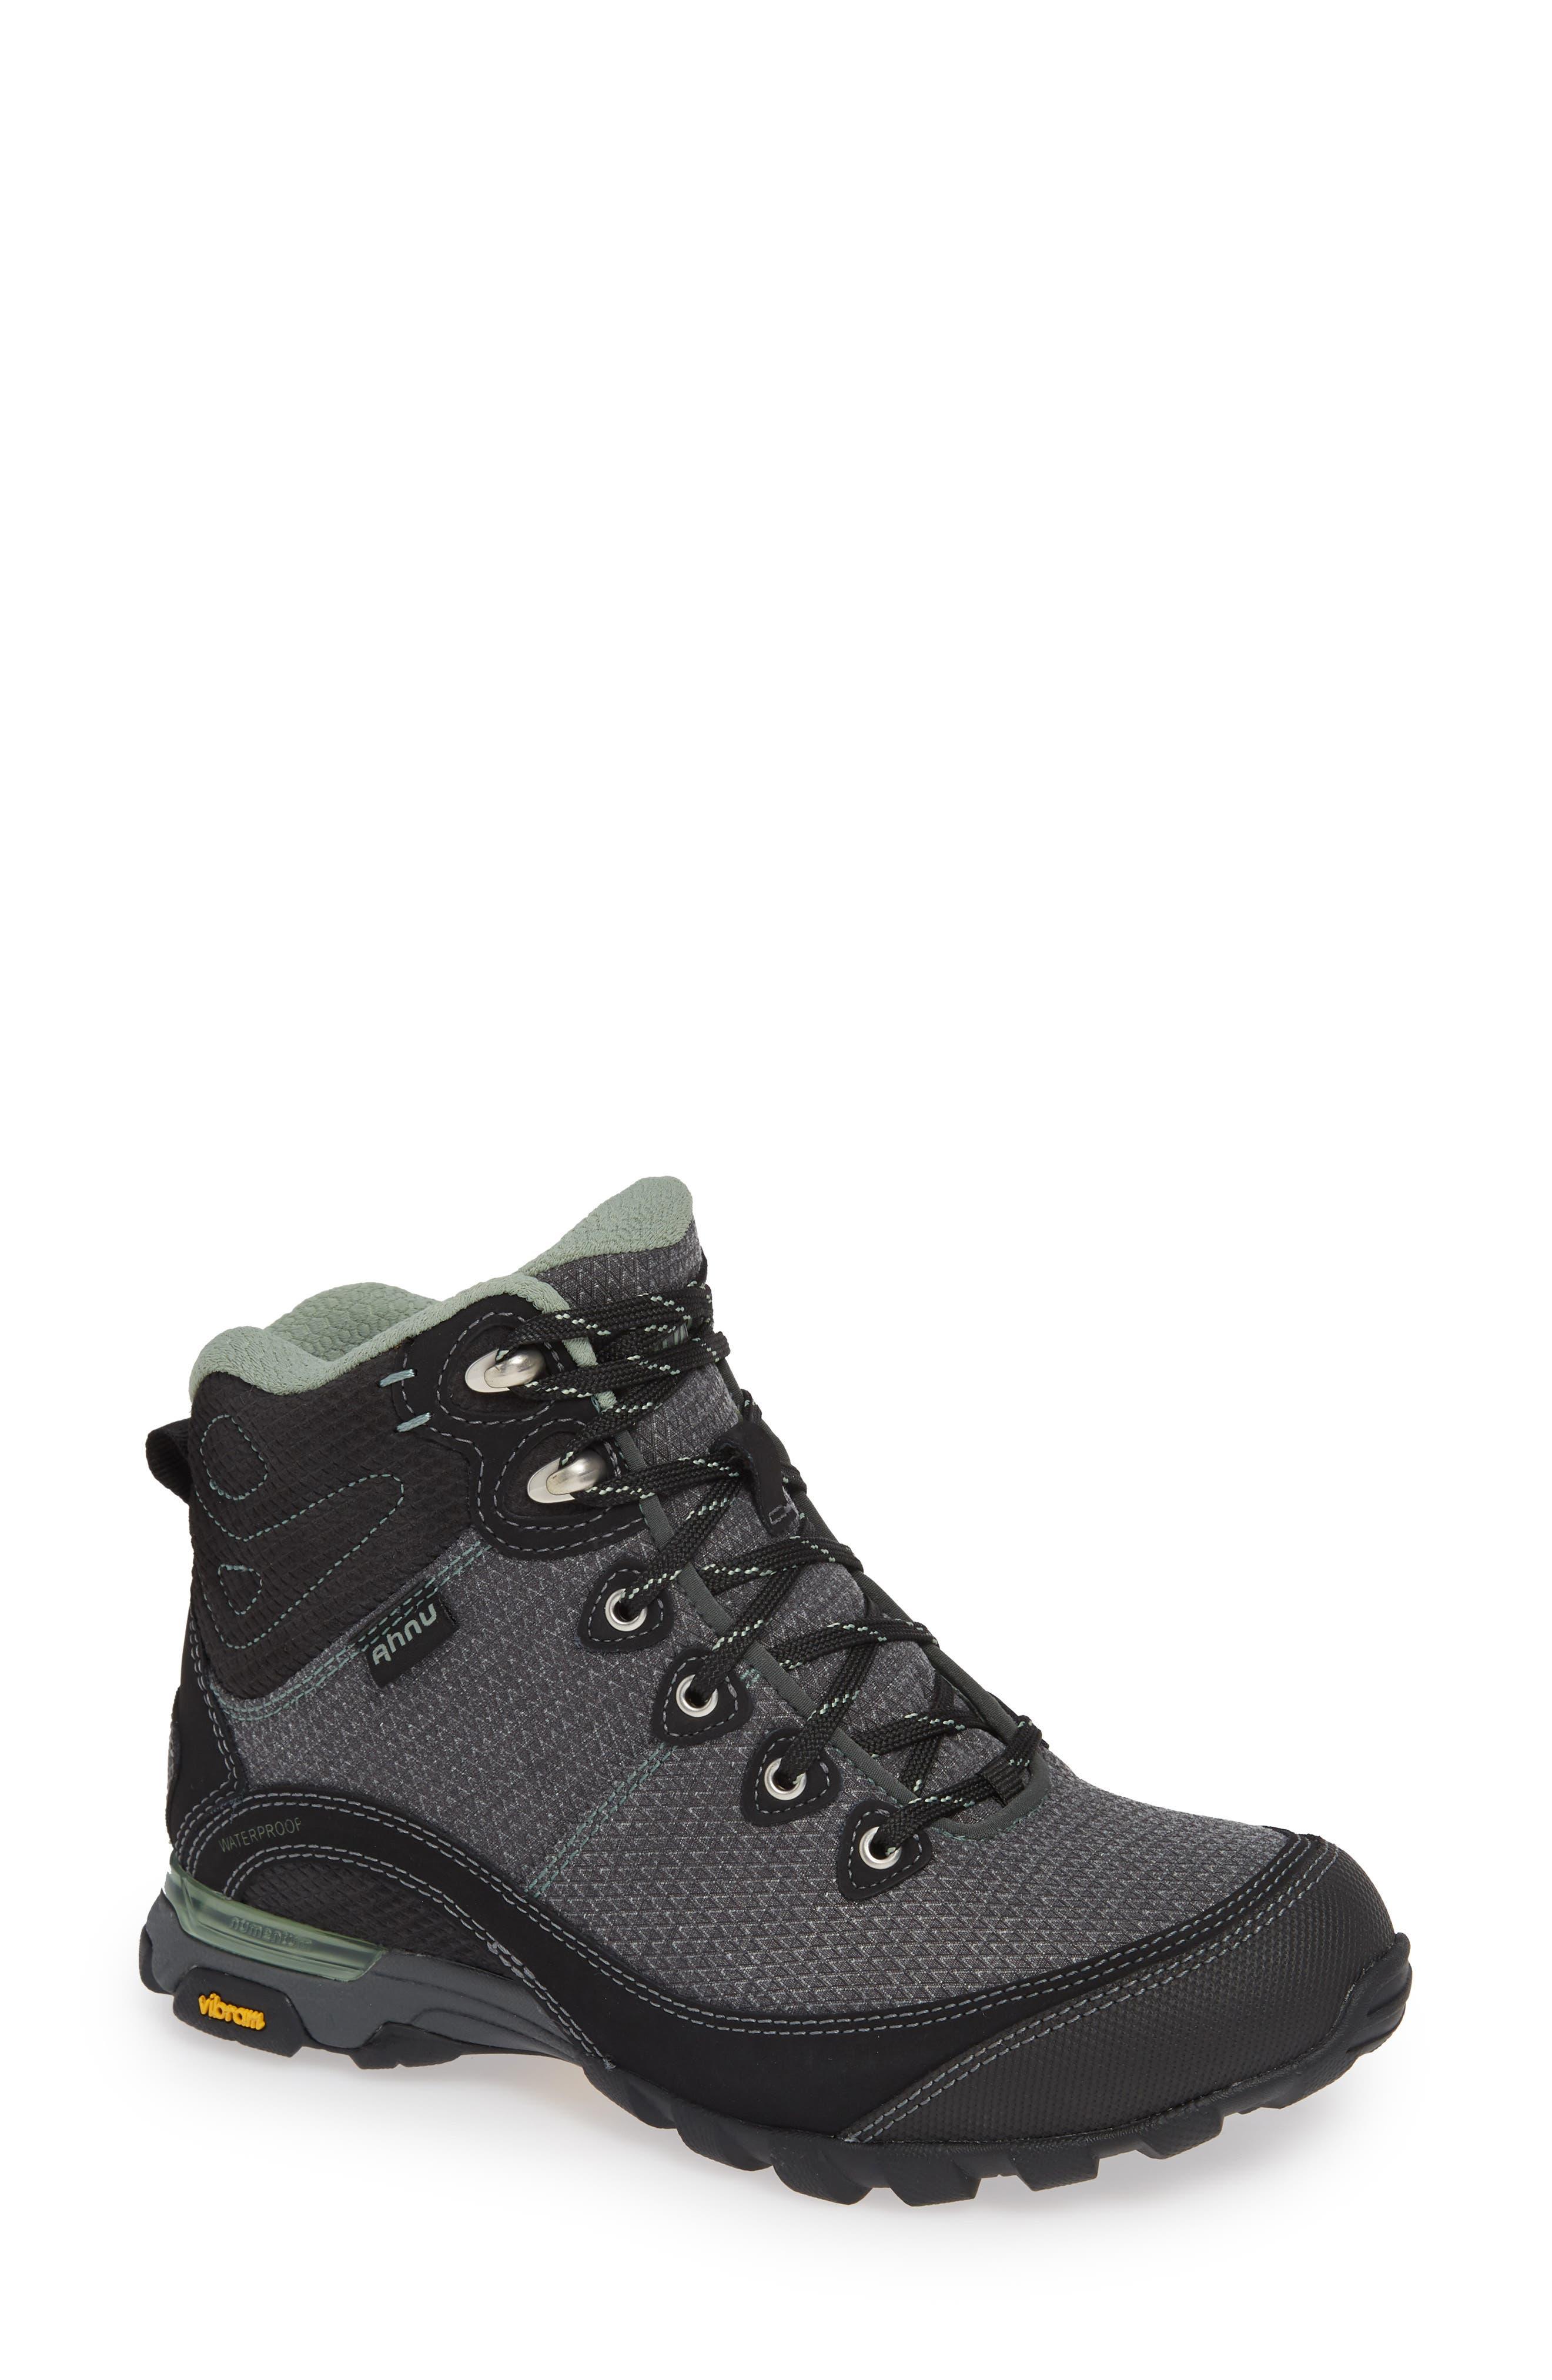 Ahnu by Teva Sugarpine II Waterproof Hiking Boot,                         Main,                         color, BLACK/ GREEN BAY FABRIC